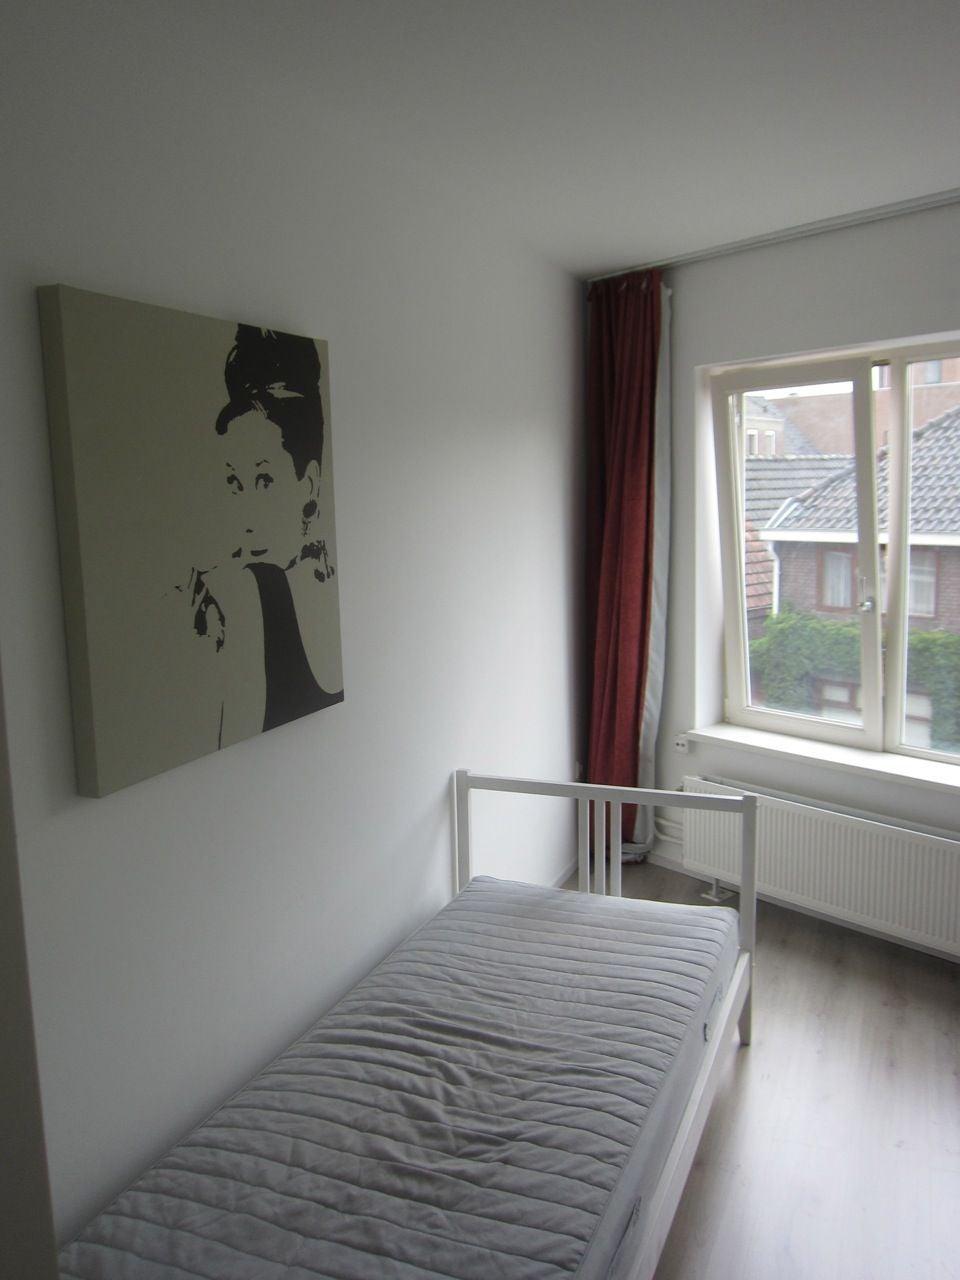 https://public.parariusoffice.nl/298/photos/huge/83.1396950754-492.jpg